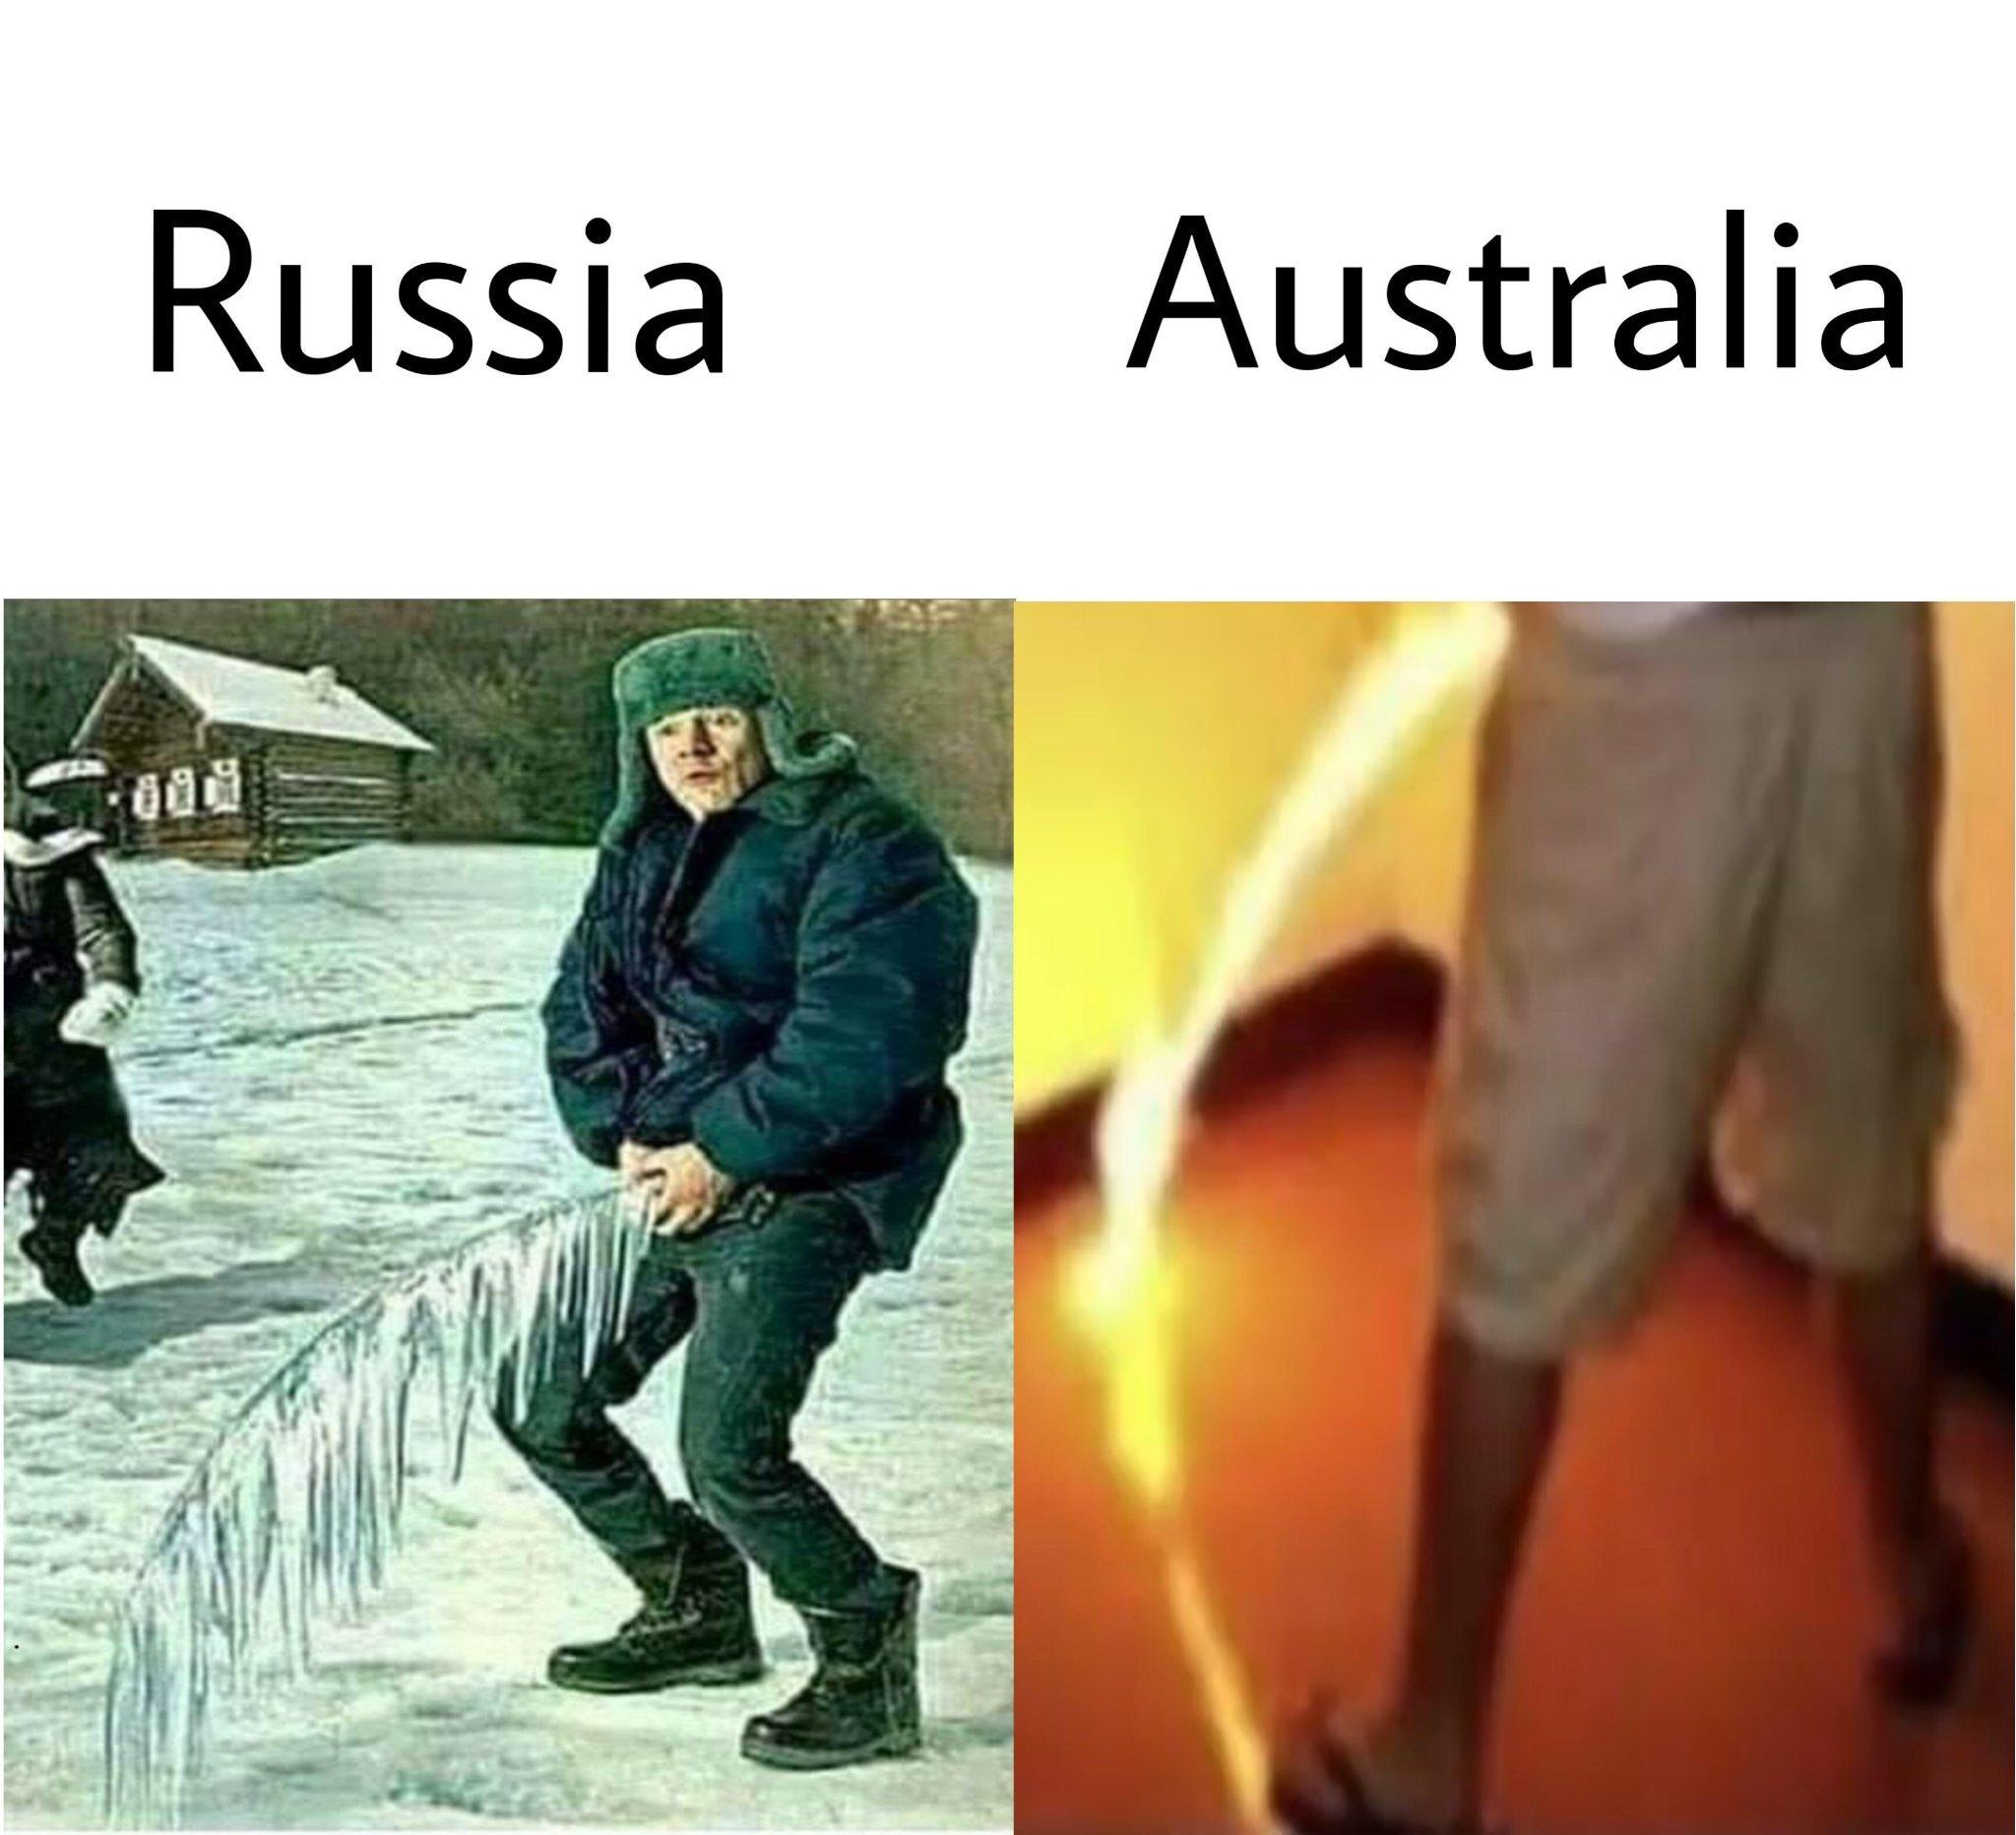 Russia Vs Australia Meme By Axelking Memedroid